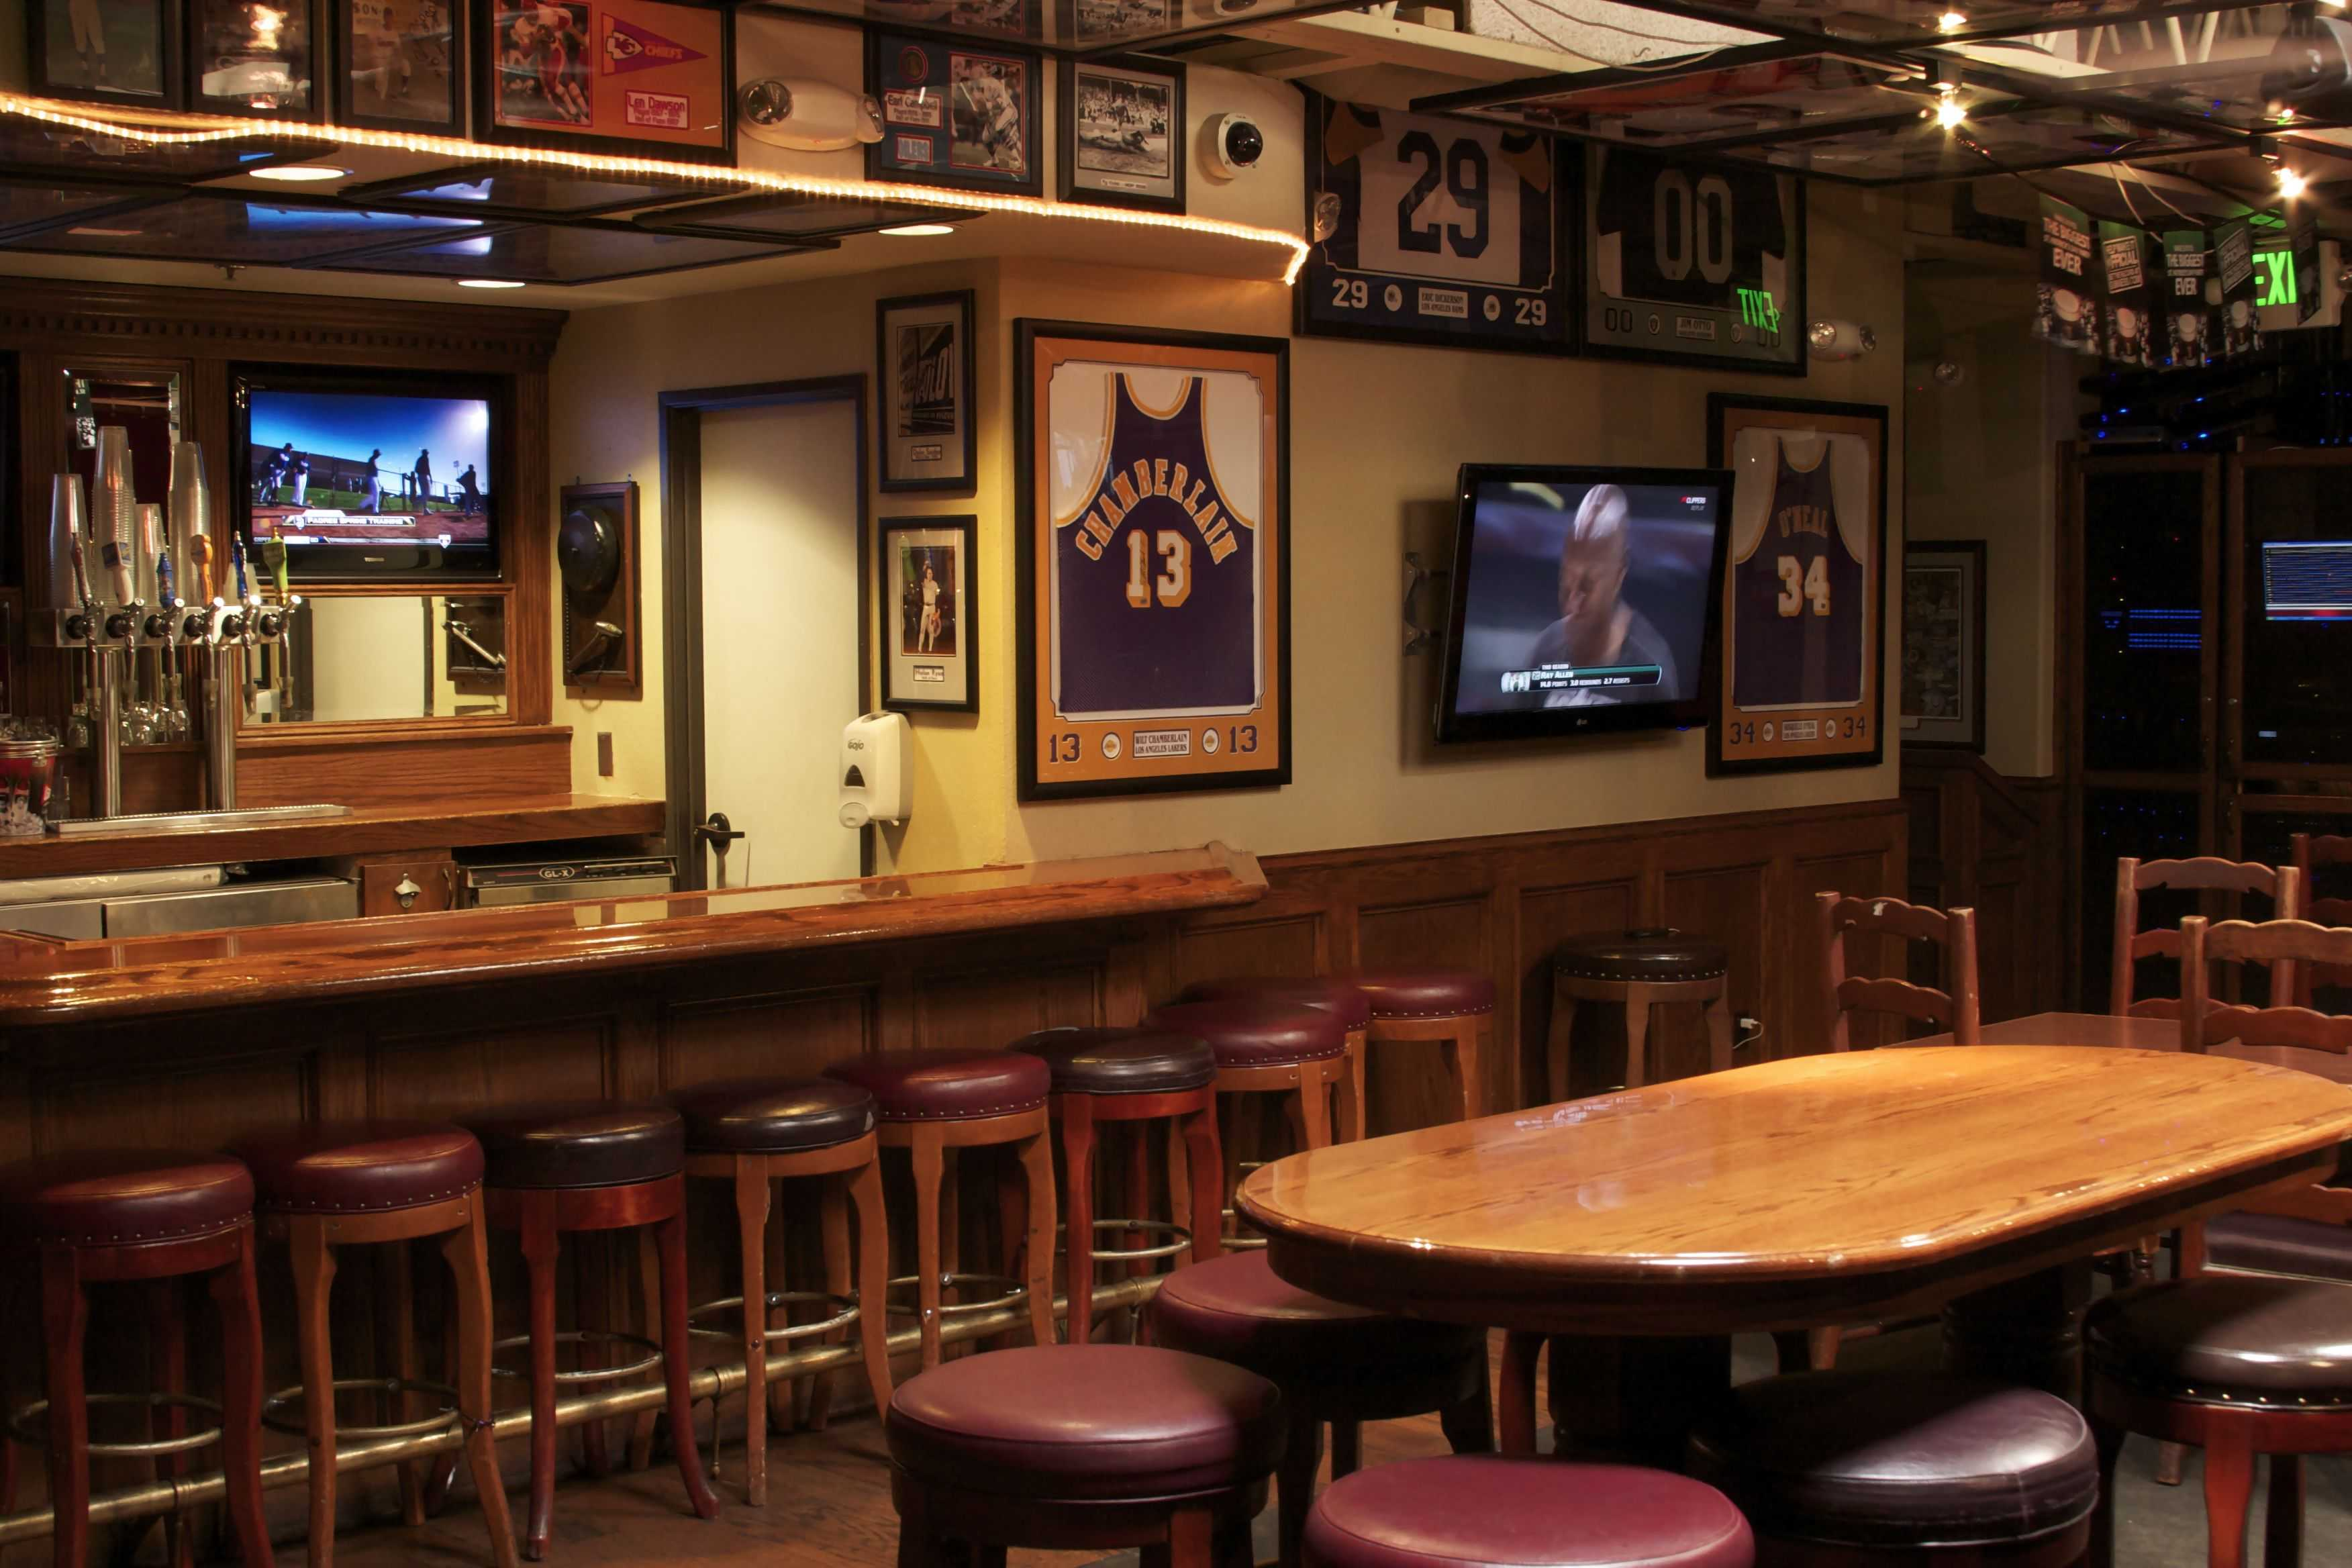 Skybox at legends sports bar legends sports bar long beach - Bar room pictures ...